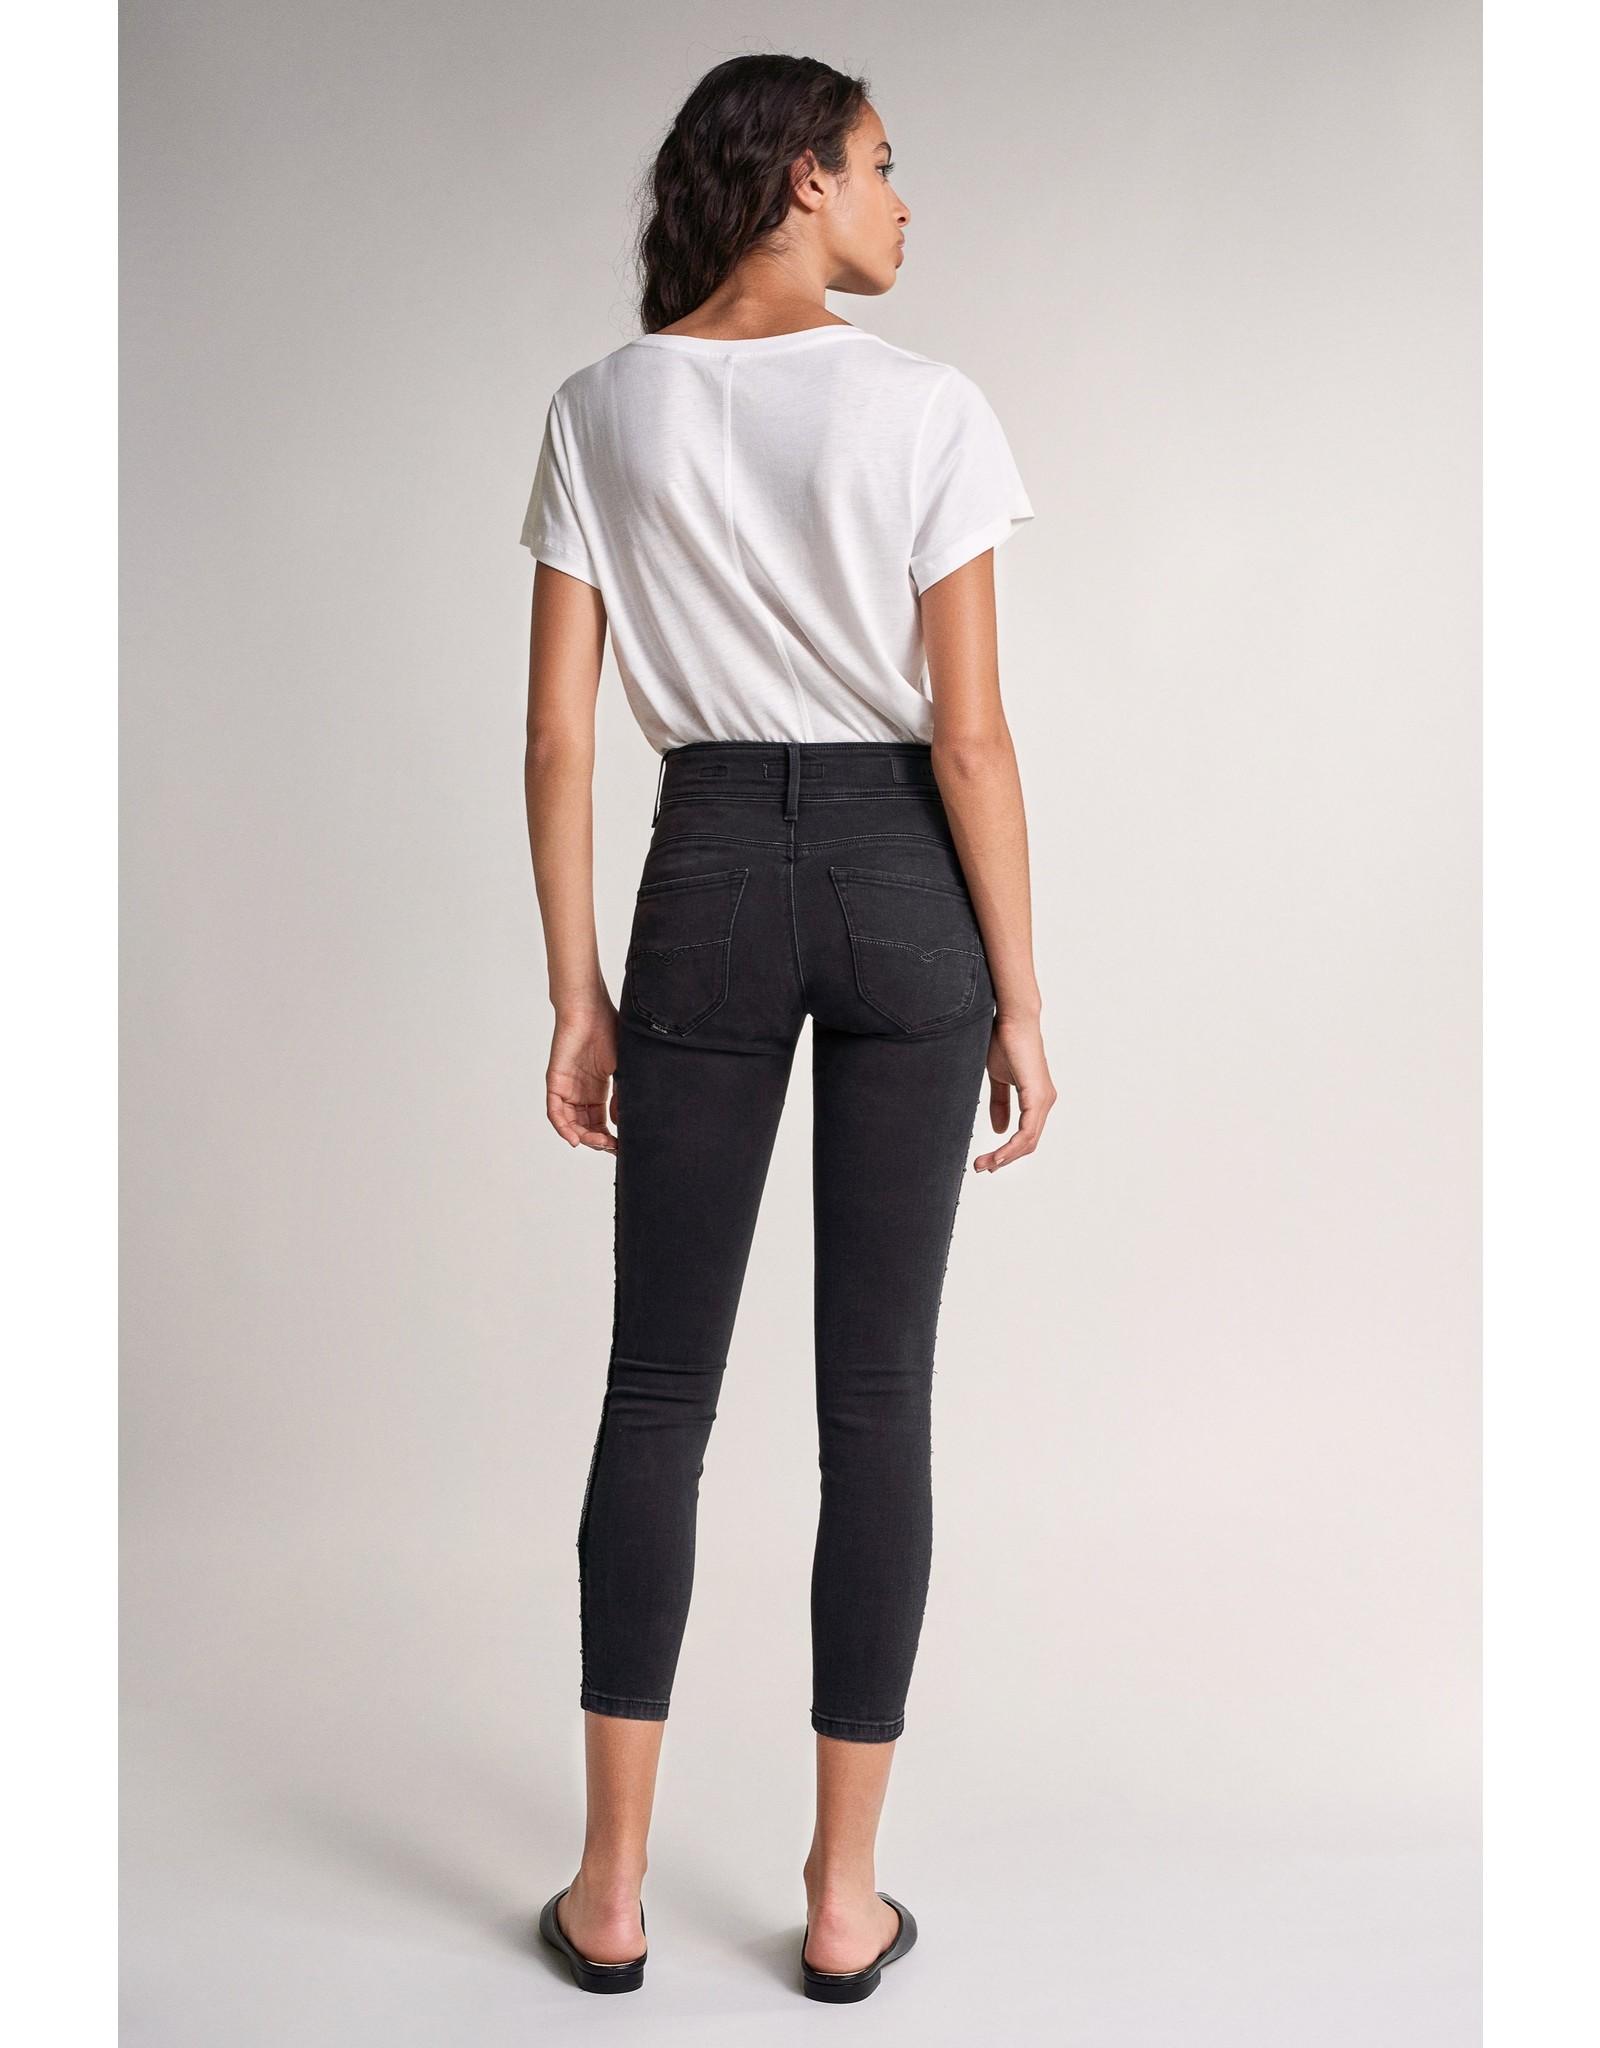 Salsa Jeans Push In Secret Capri Black Jeans With Side Strip